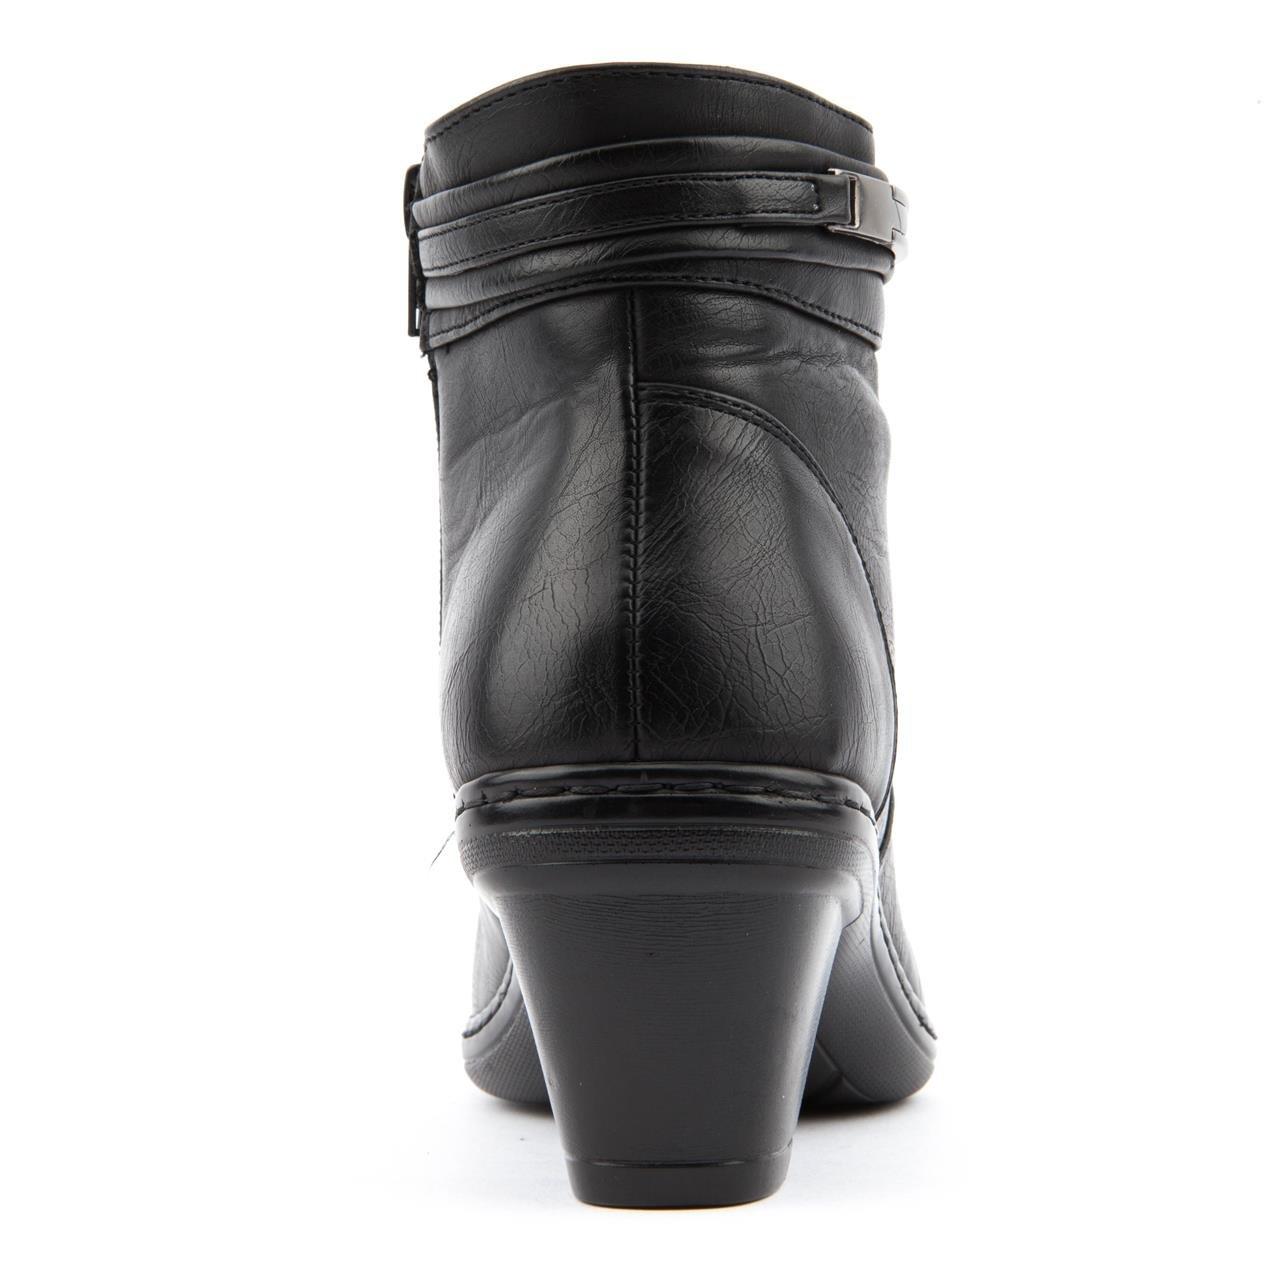 dc6108a9886c Ladies Caravelle Wide Fit Daisy Black Ankle Boots Size 8  Amazon.co.uk   Shoes   Bags